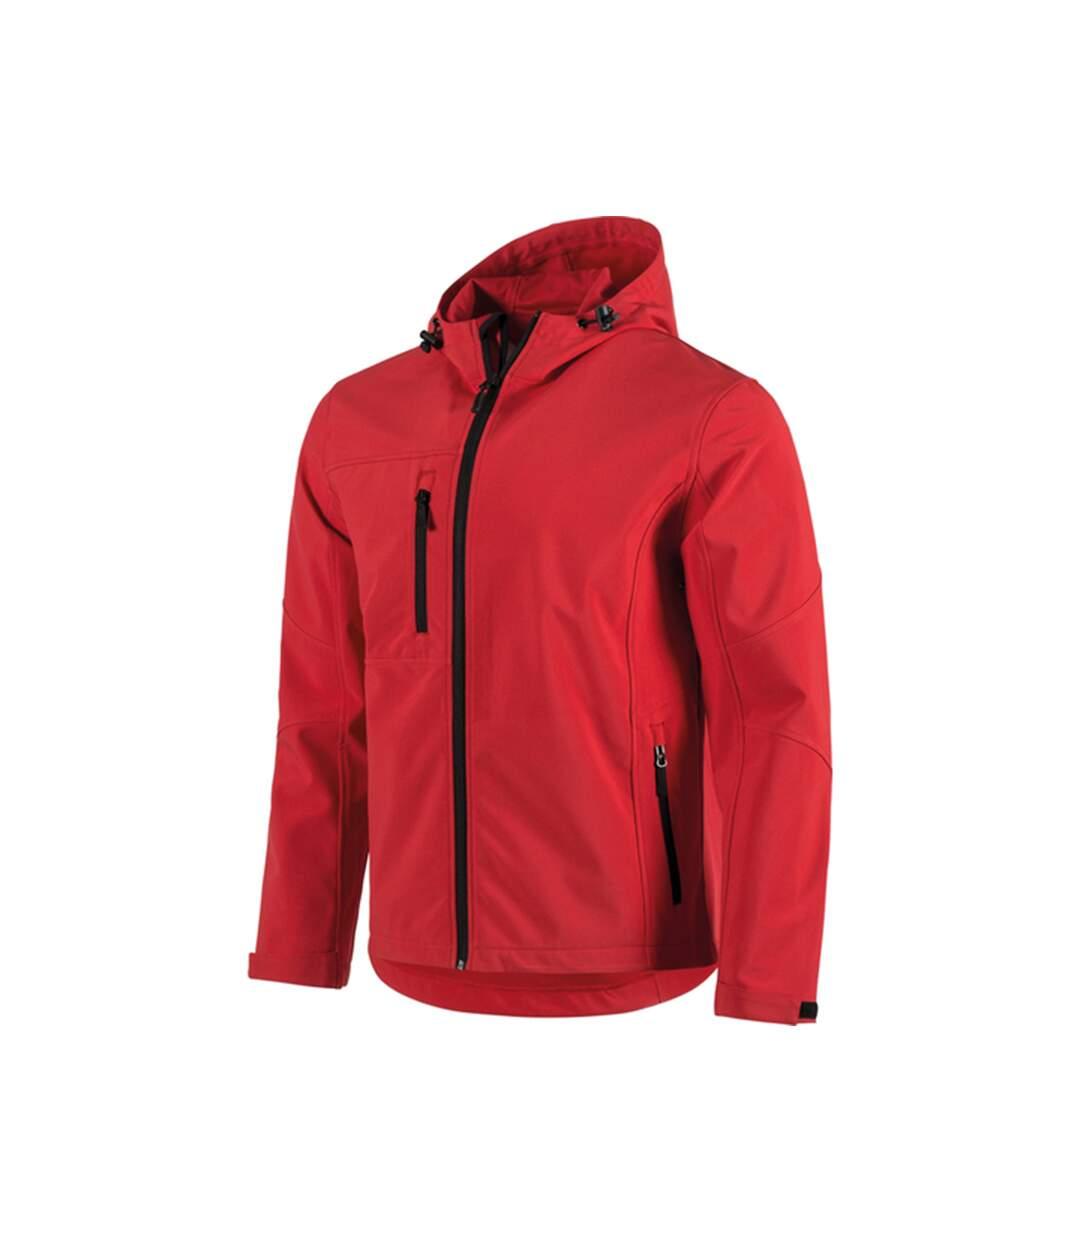 Stedman - Softshell À Capuche Active (Blanc) - UTAB308